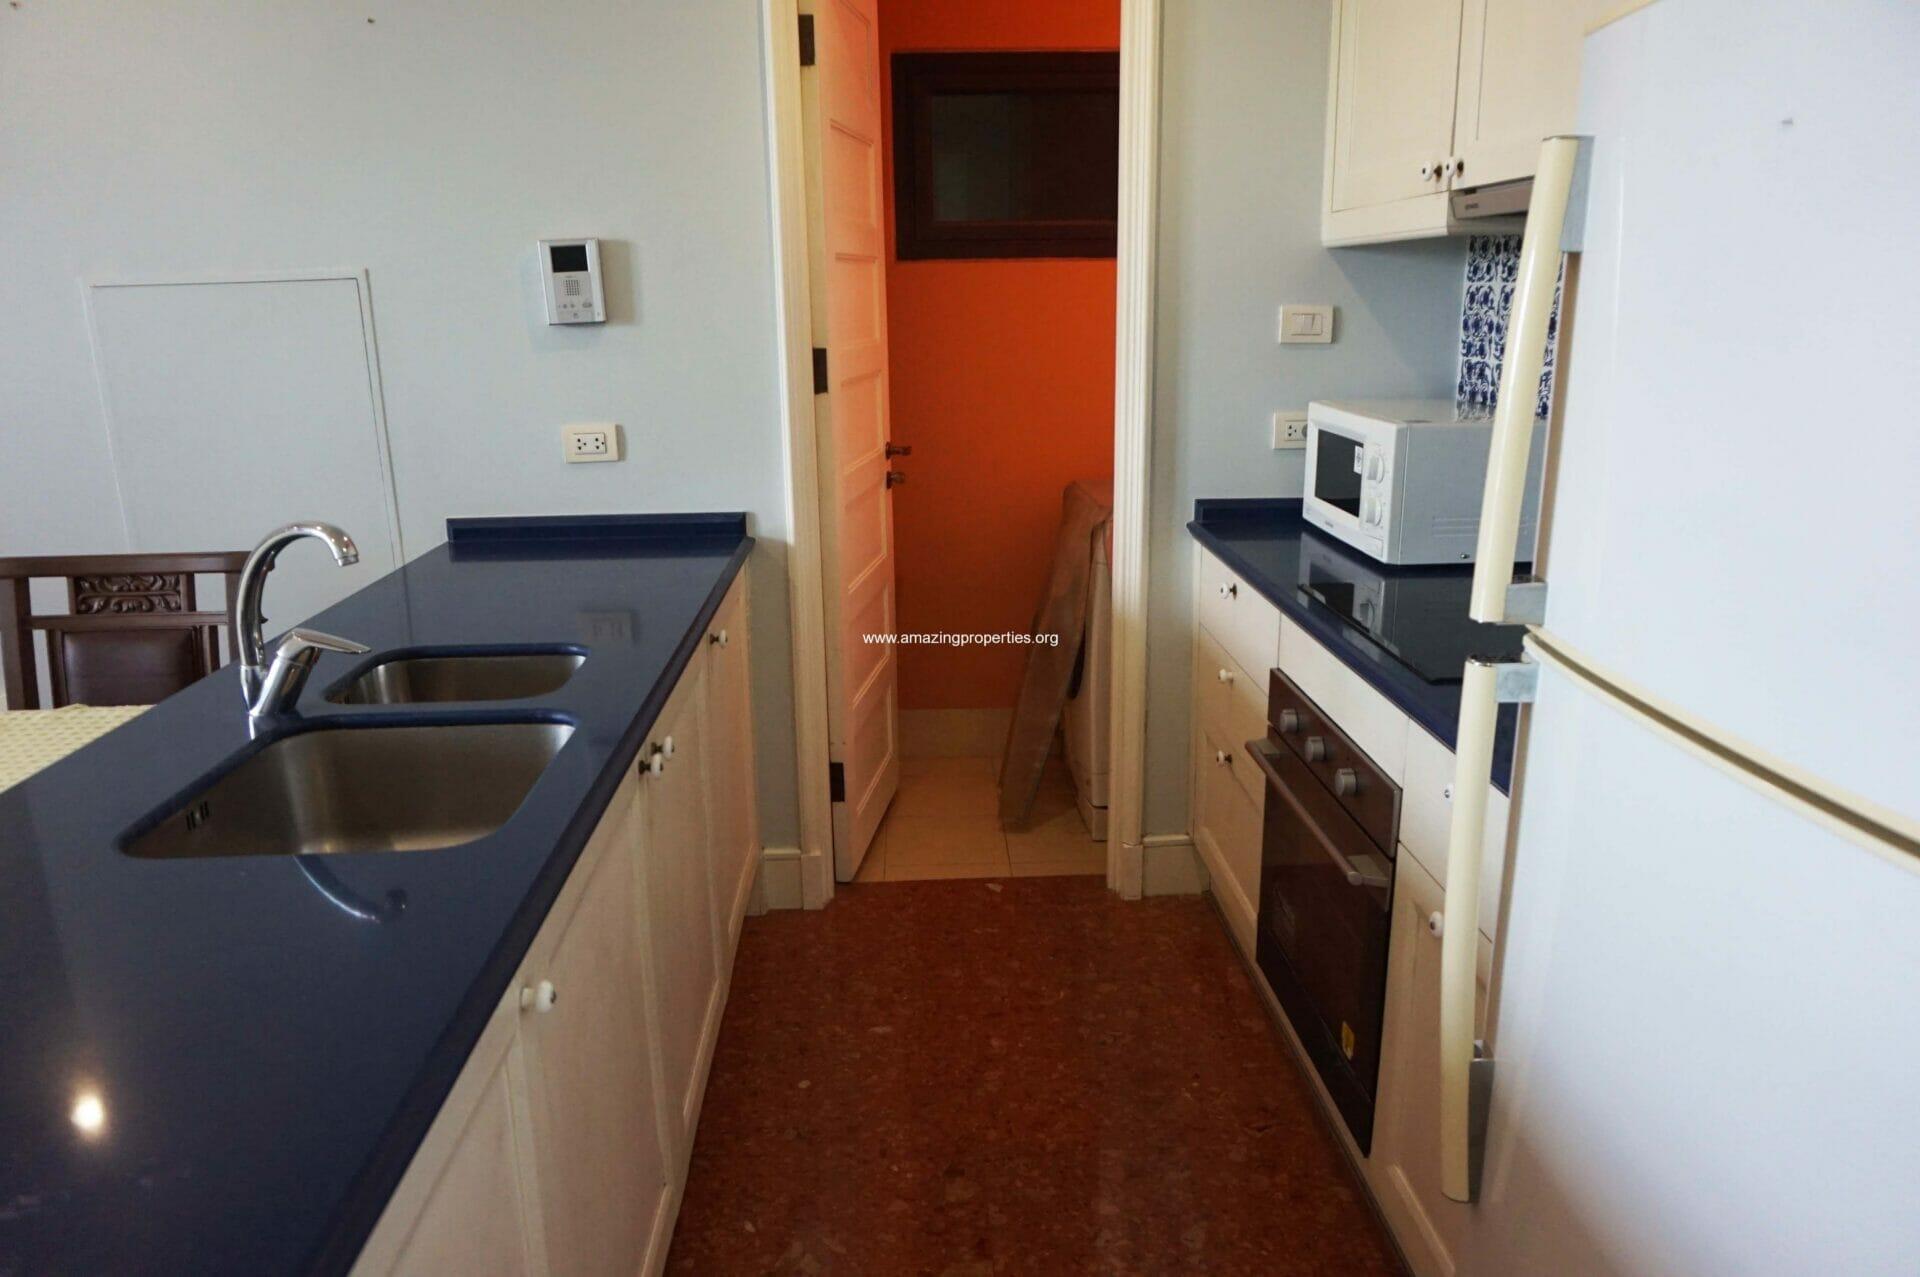 2 Bedroom Condo Aguston Sukhumvit 22-8